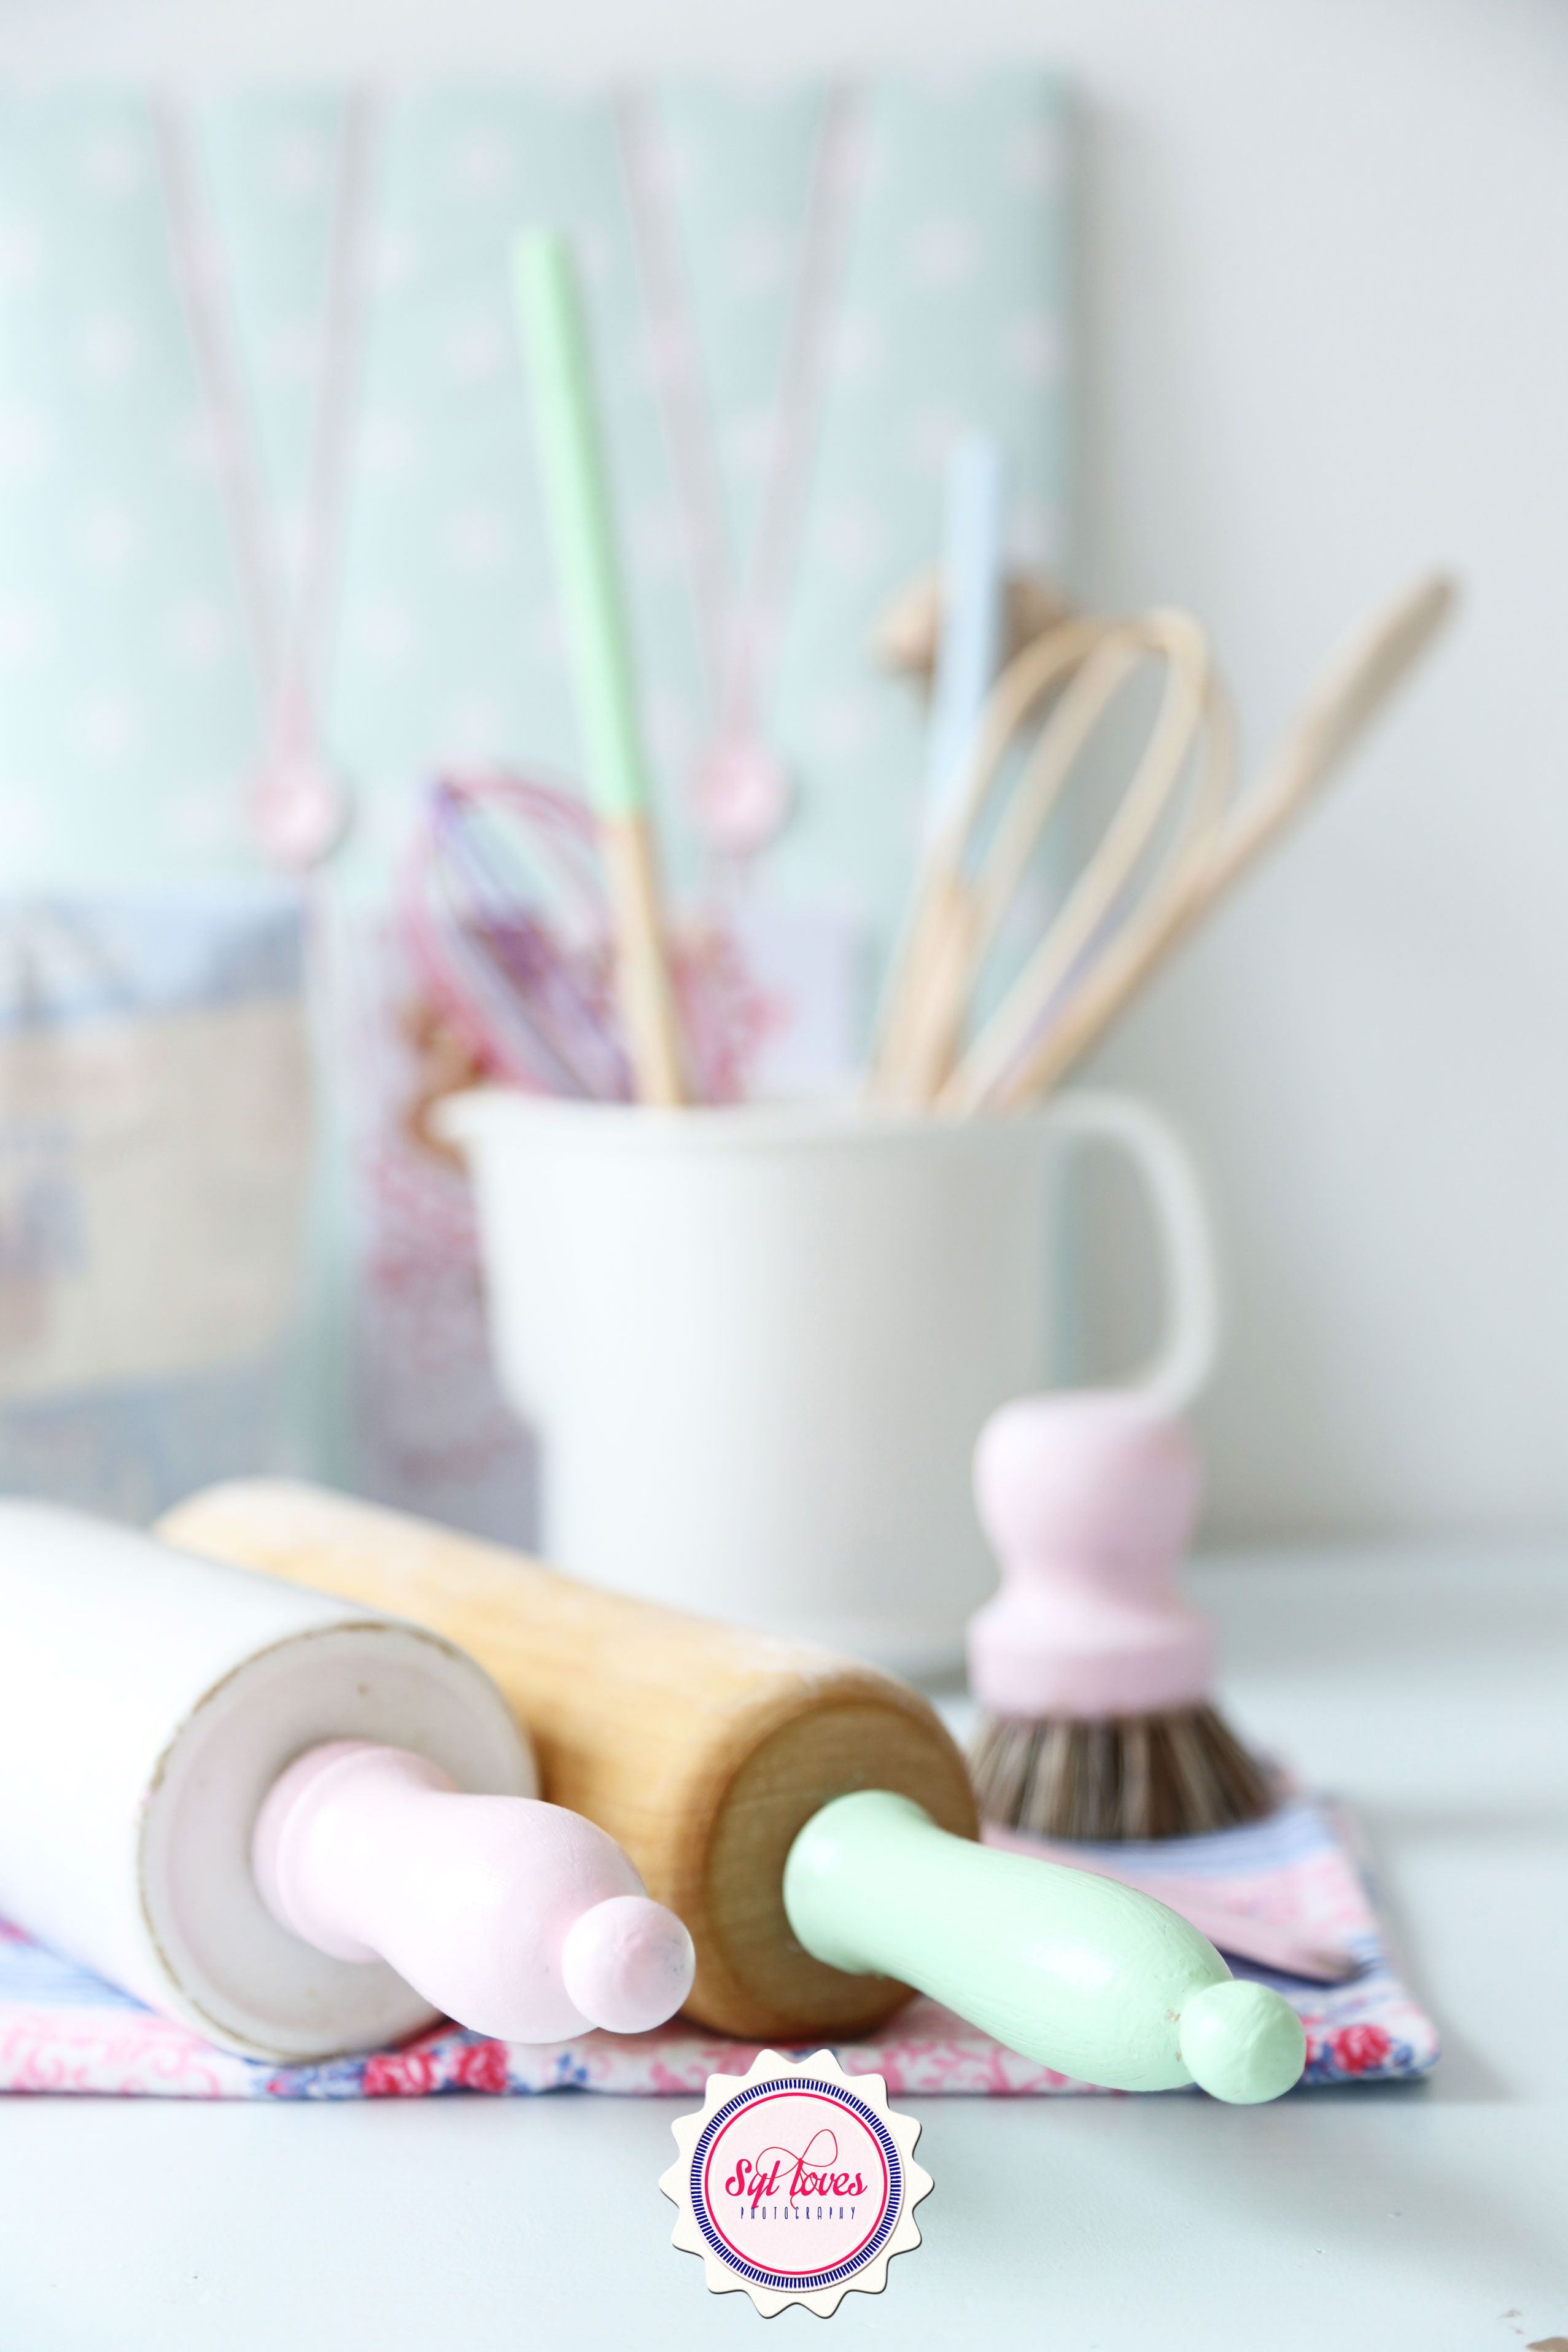 pin by anje snyman on huis pinterest pastel kitchen pastels